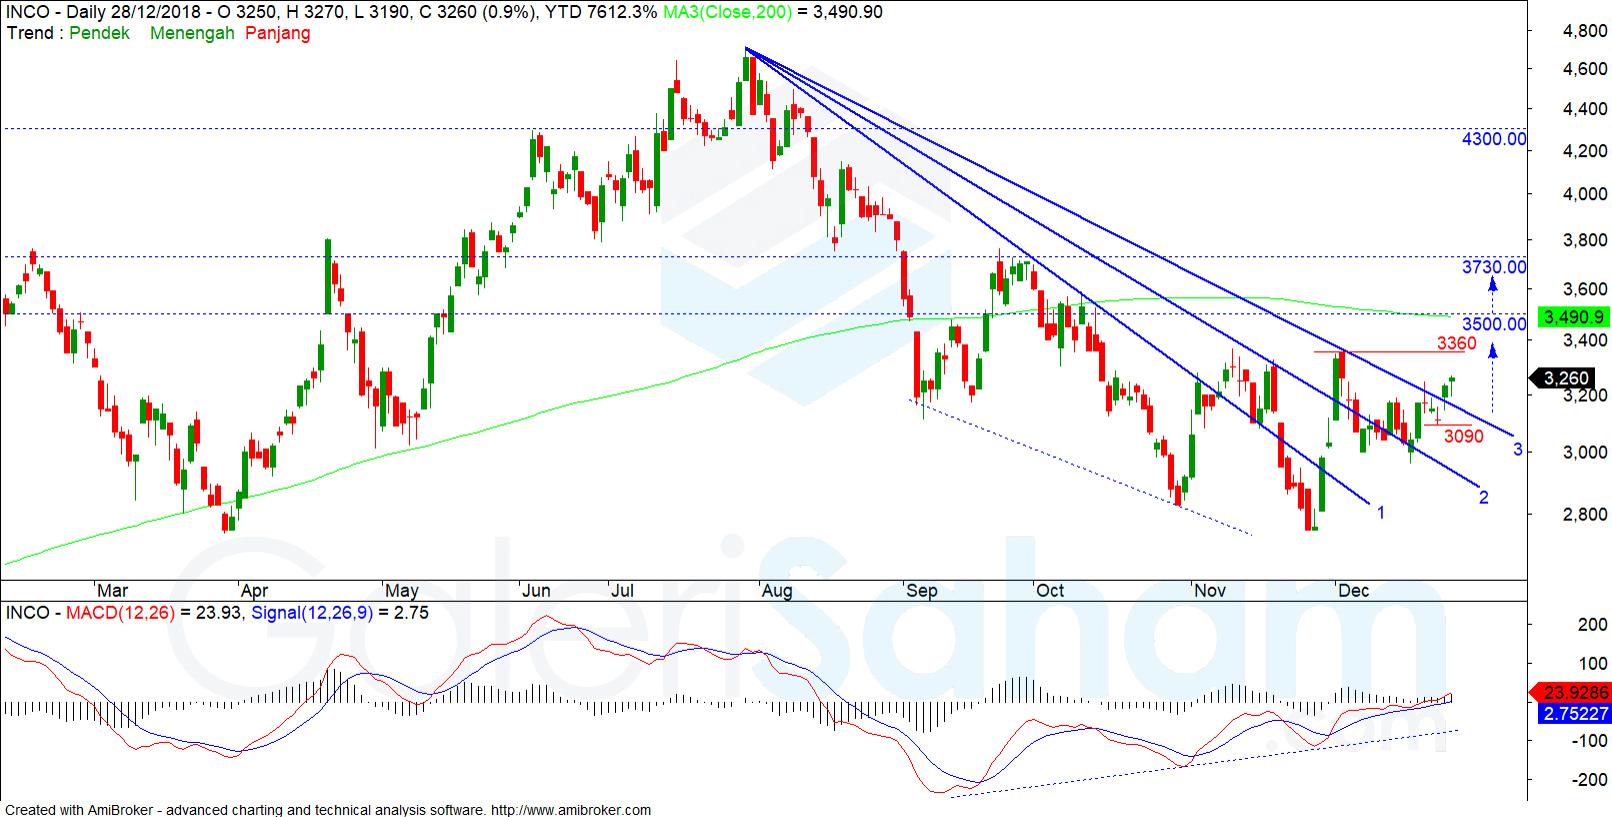 analisa saham INCO 190101